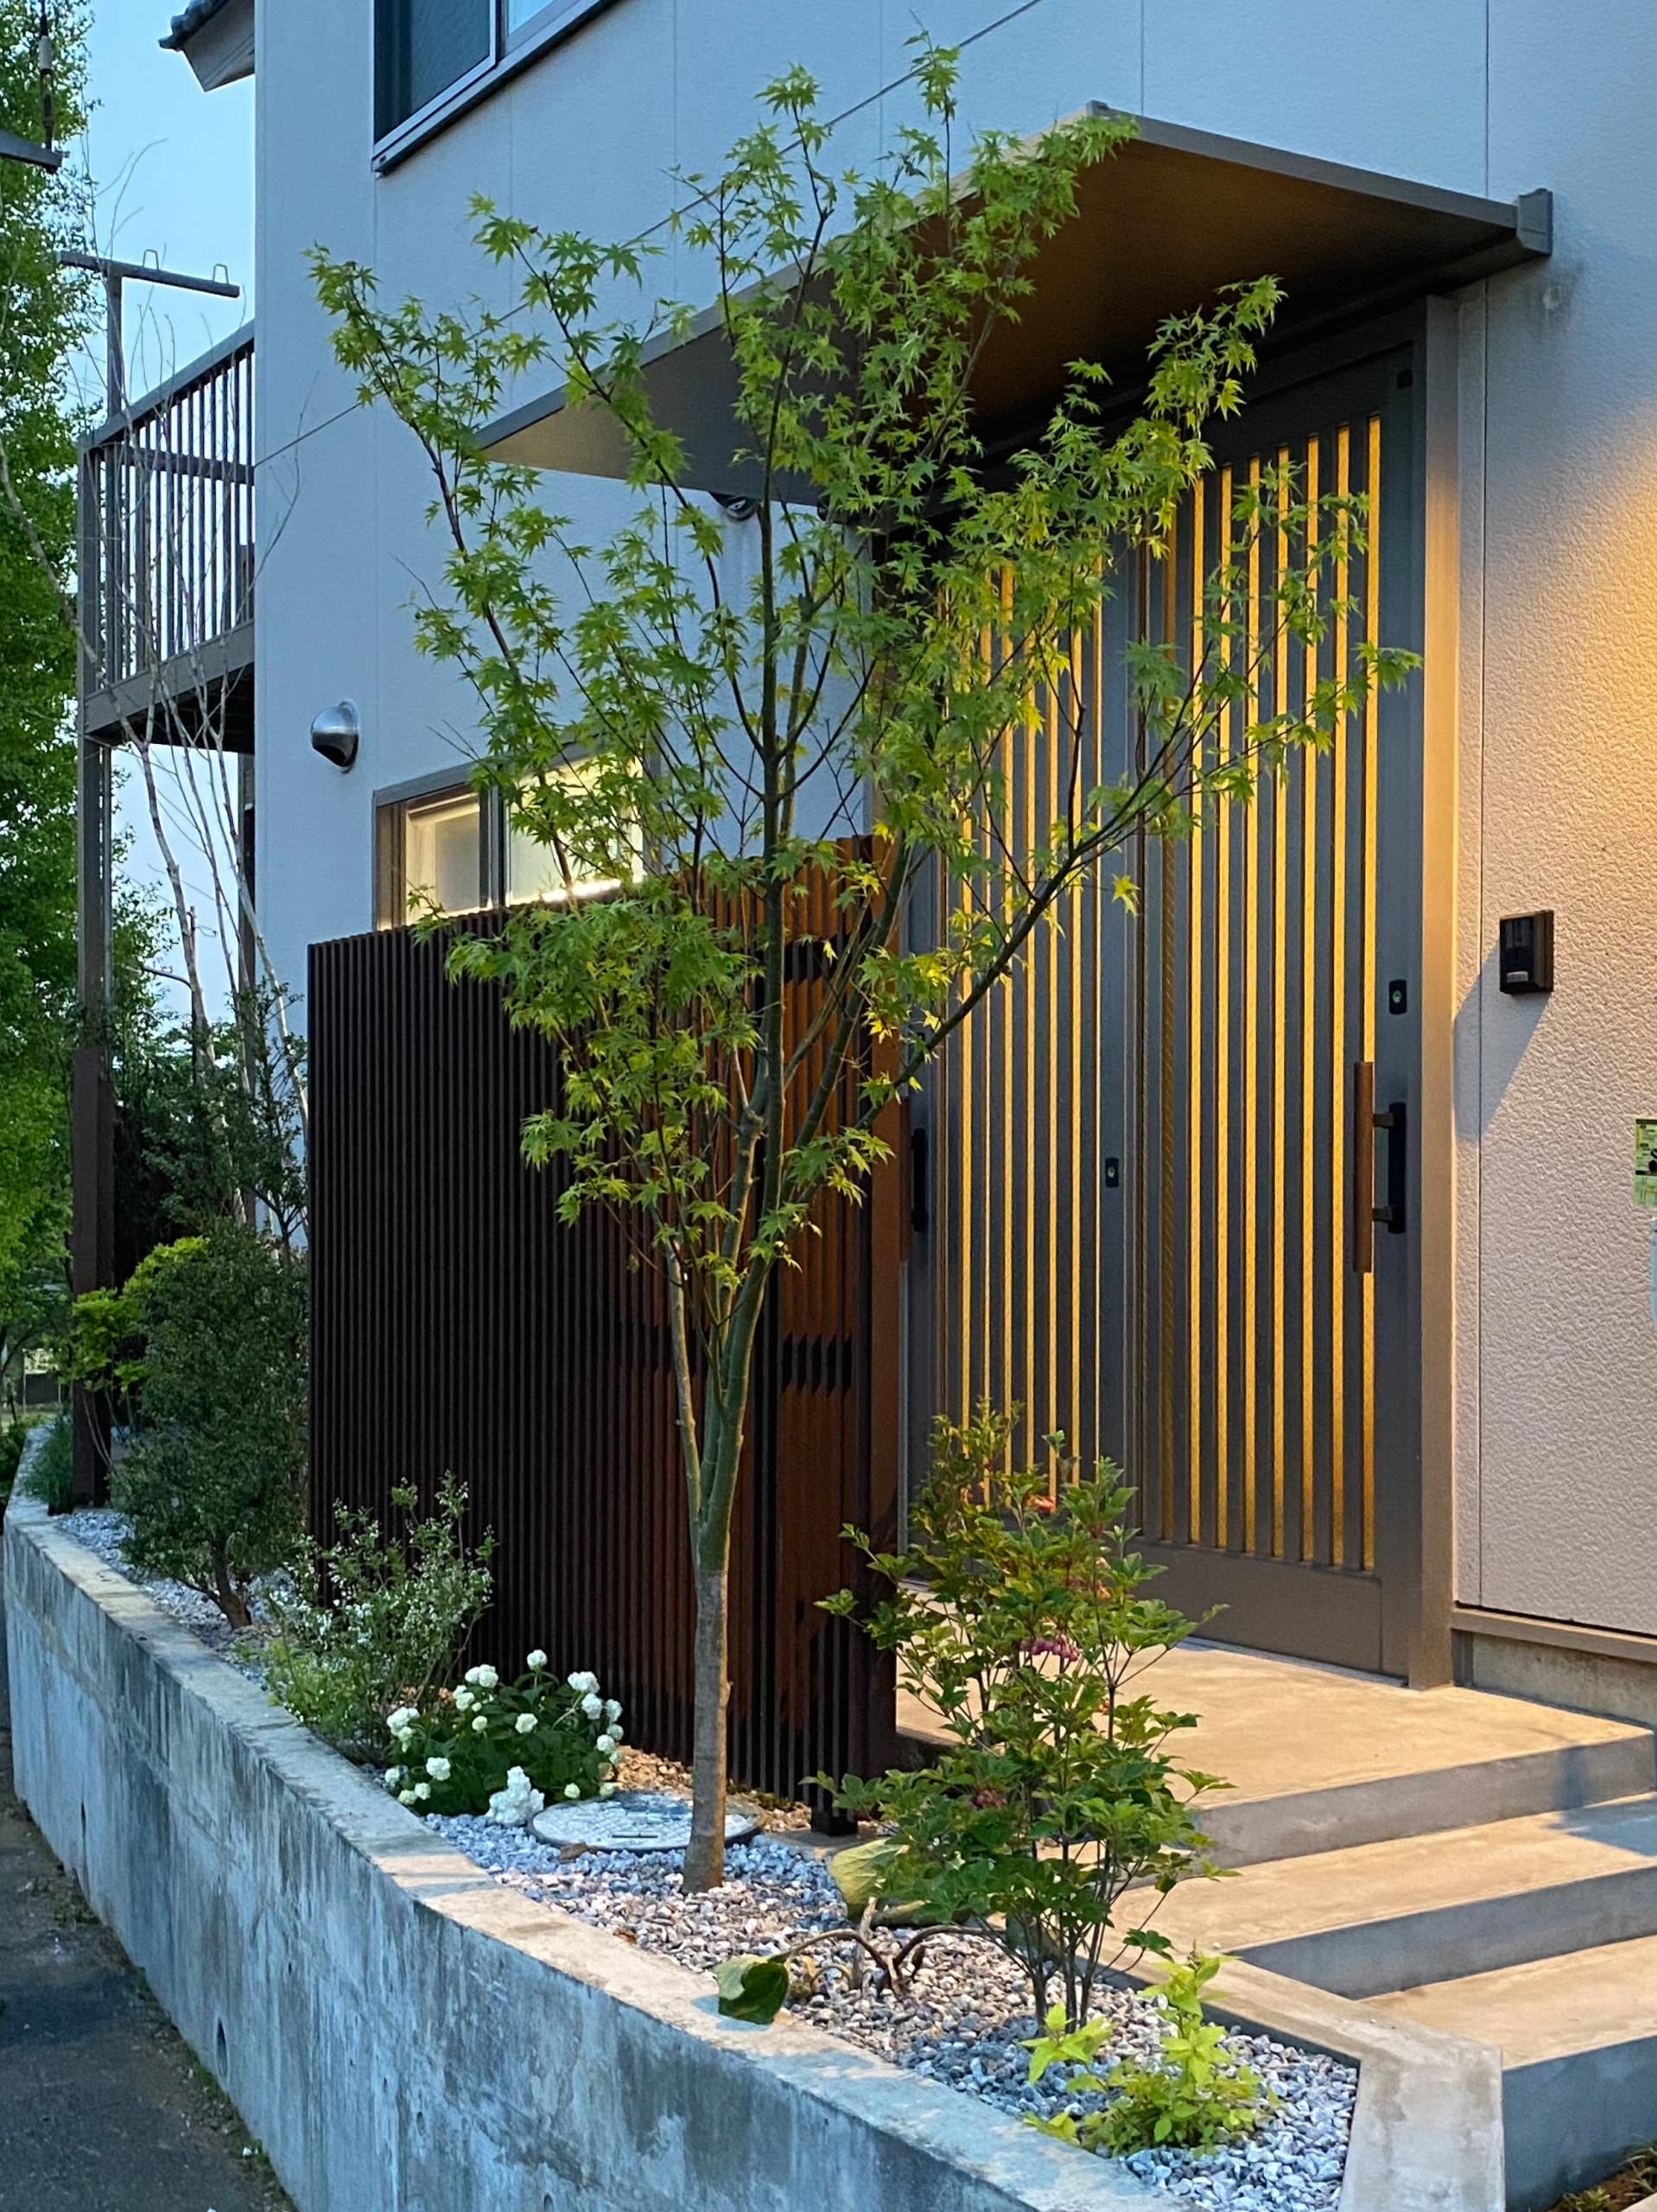 Hハウス改修工事/玄関アプローチ